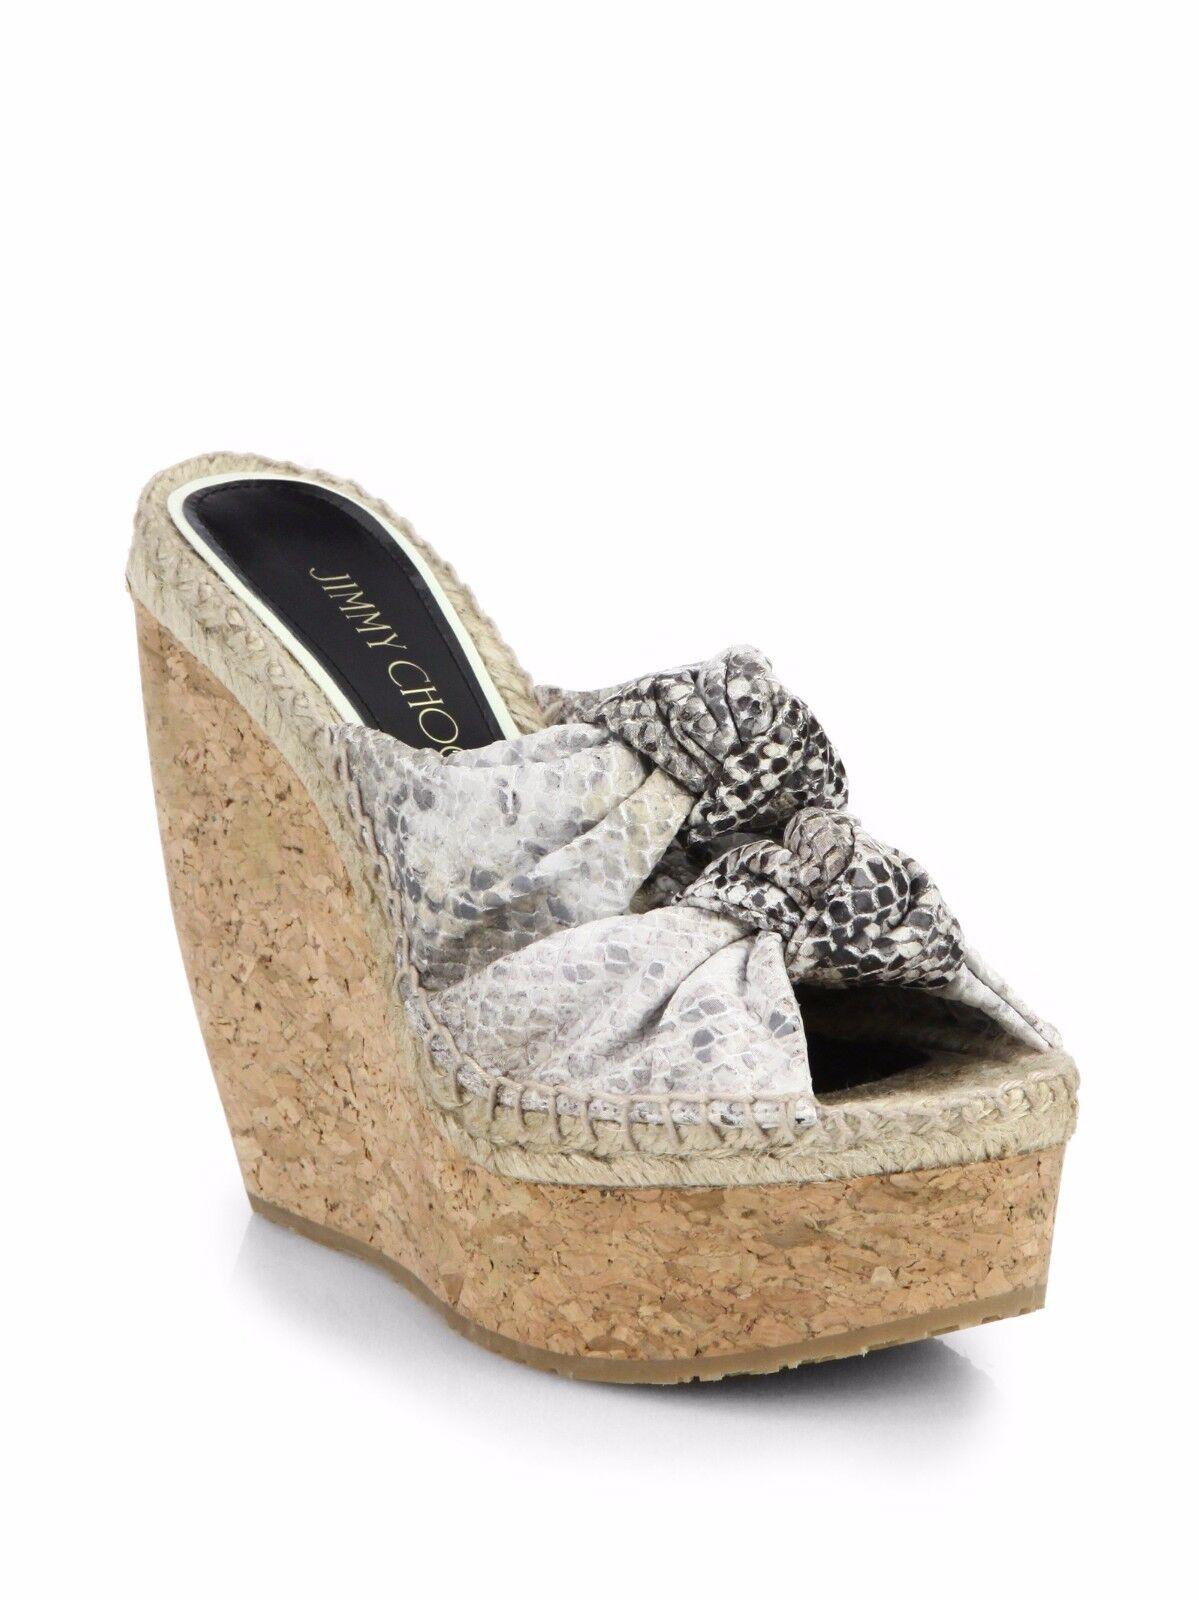 Neu Jimmy Choo Verknotet Schlange Plateau Keilabsatz Sandalen Schuhe 37 40.5 42